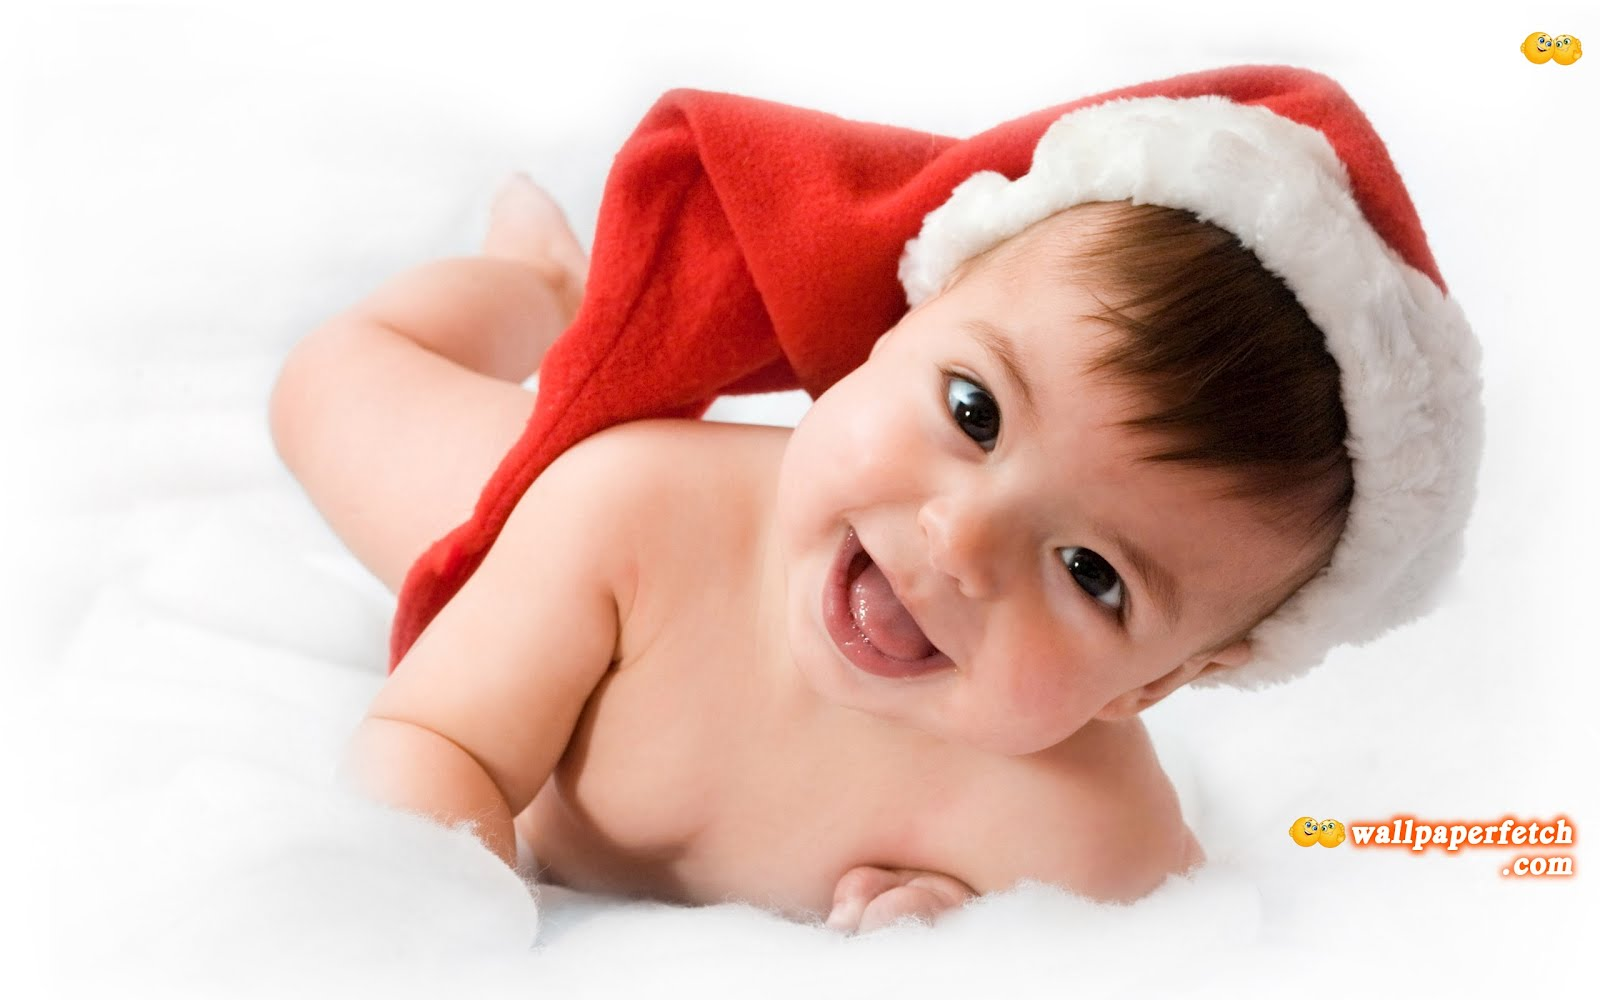 http://3.bp.blogspot.com/-radakxaHtBY/UAOvwVMM_JI/AAAAAAAAFyo/eOGnCYR9Iuc/s1600/Cute-Baby-Wallpapers.jpg